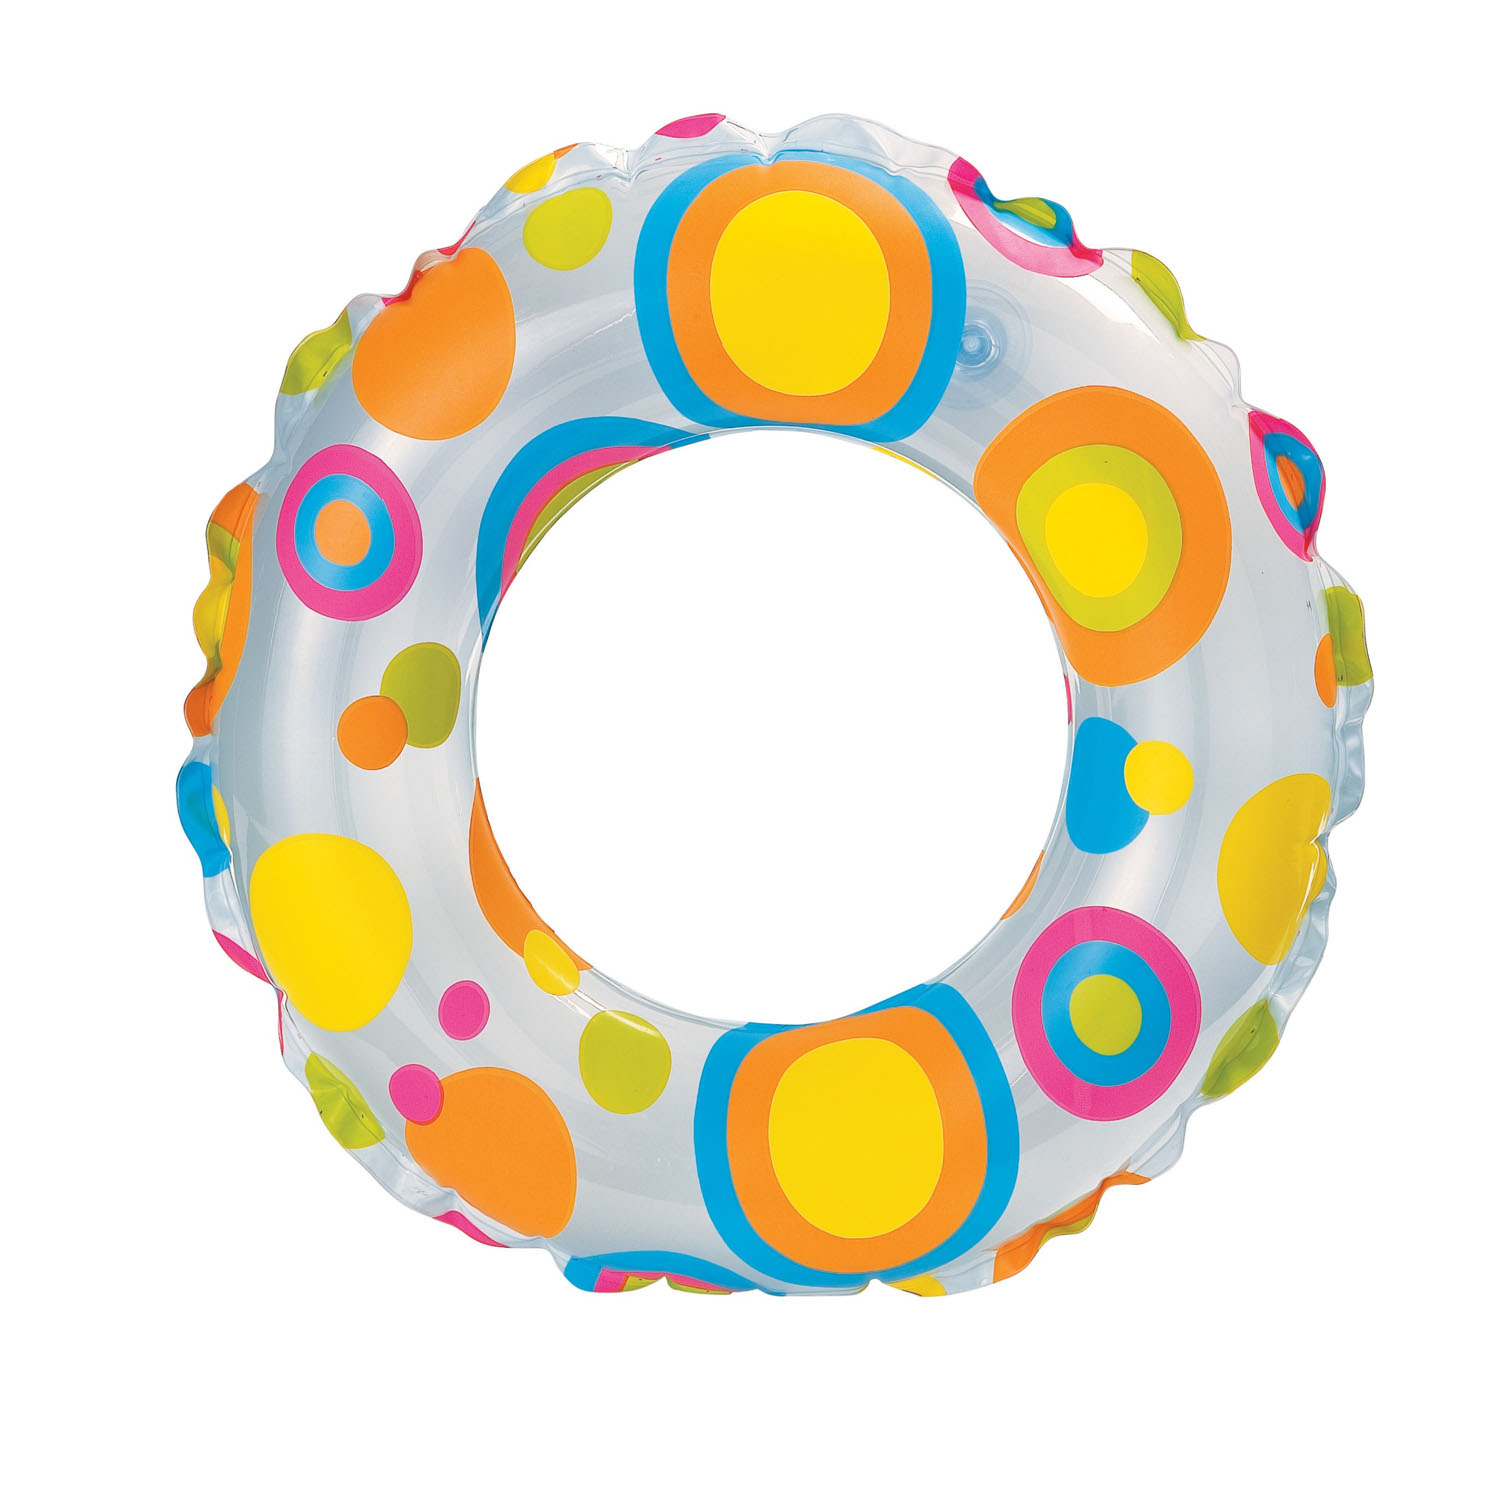 Купить Круг надувной Lively Print Swim Rings, Intex